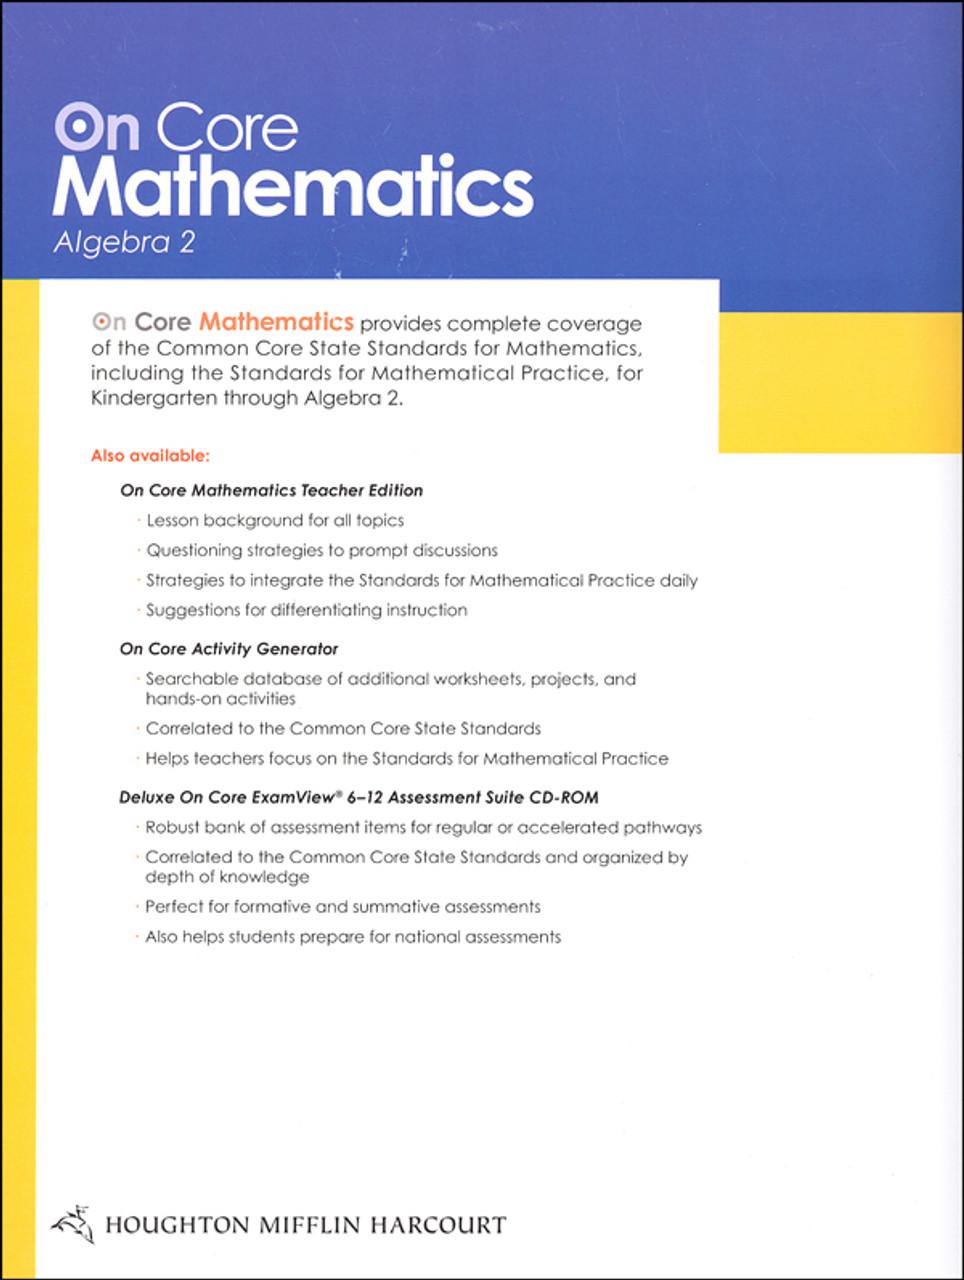 hight resolution of On Core Math - Houghton Mifflin Harcourt - Grade 9-12 Algebra 2 Student  Worktext - Classroom Resource Center